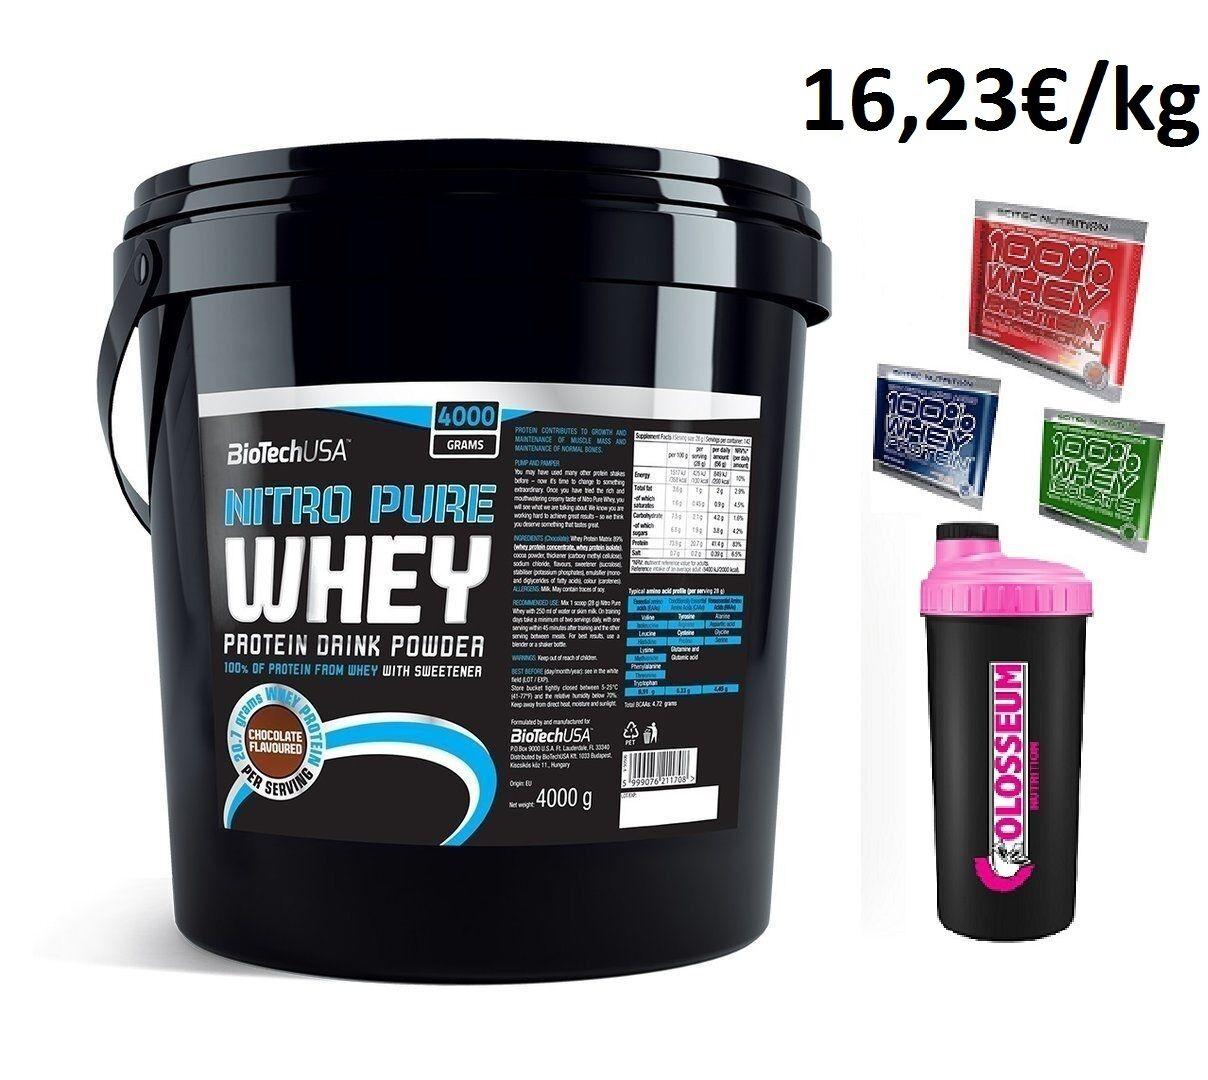 Biotech USA Nitro Pure Whey Whey Whey - 4000g + GRATIS Bonus 67c914